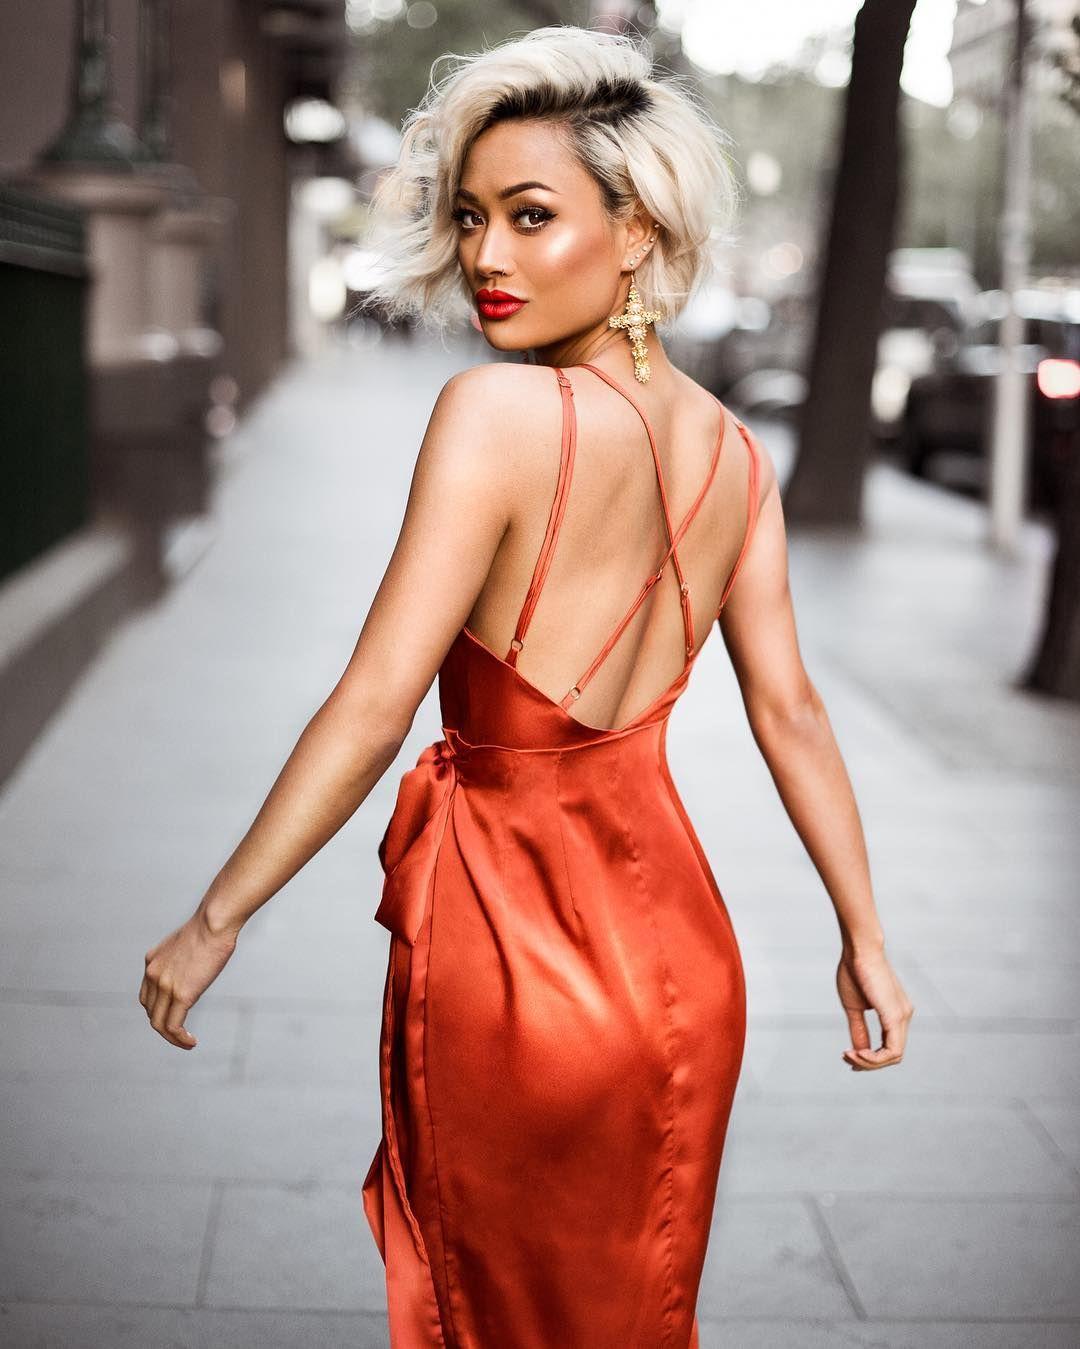 #SlickerThanYourAverage Westfield Style Ambassador Fashion Blogger Australia + Global Mgmt. | jesse@micahgianneli.com ↓New Blog Post Below↓